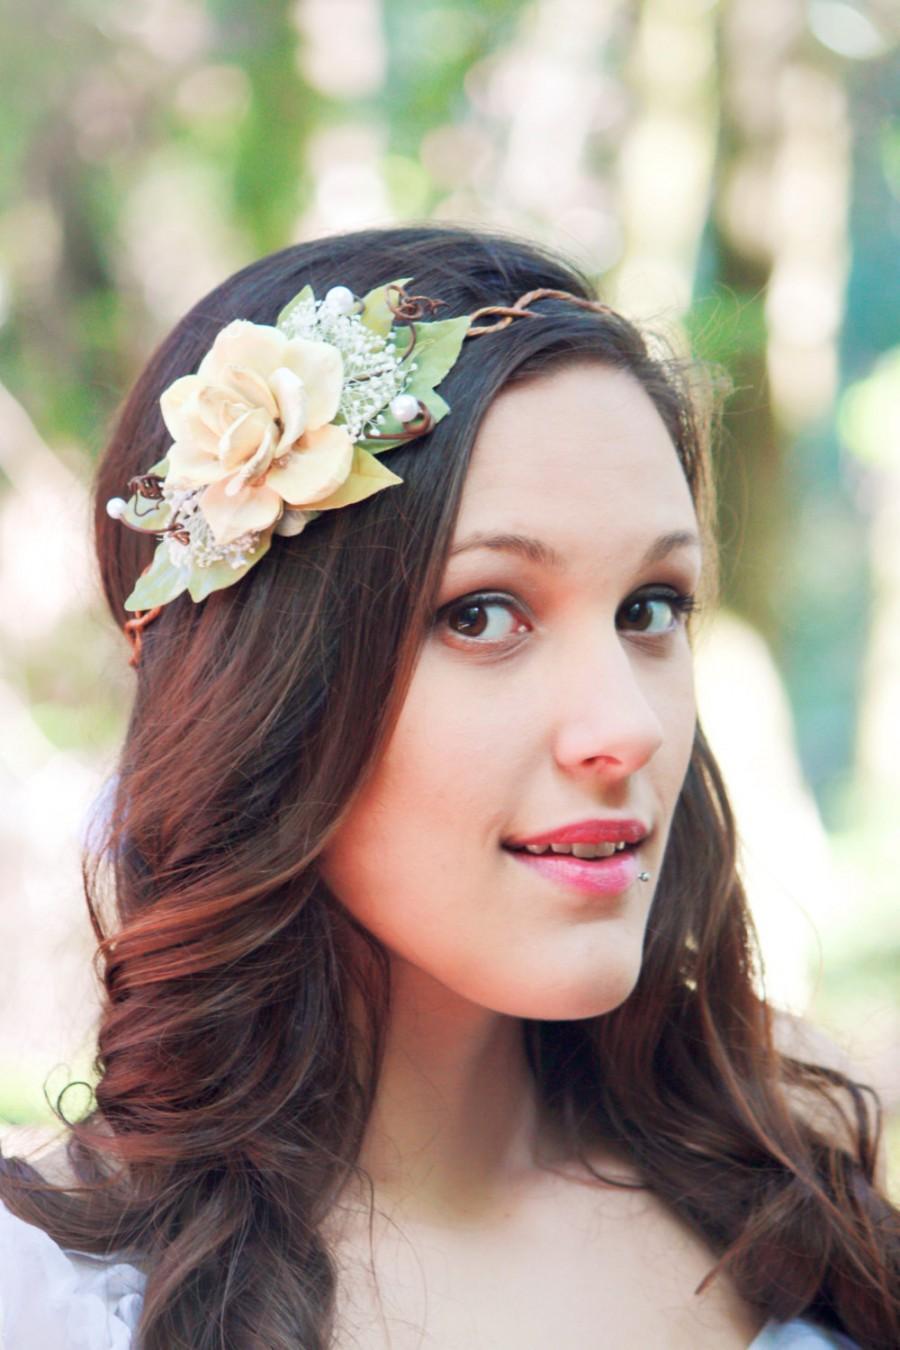 Wedding - bridal crown, bridal head piece, wedding head piece,  natuaral hair crown, natural pine cone rose floral hair crown 'Take my breath away'